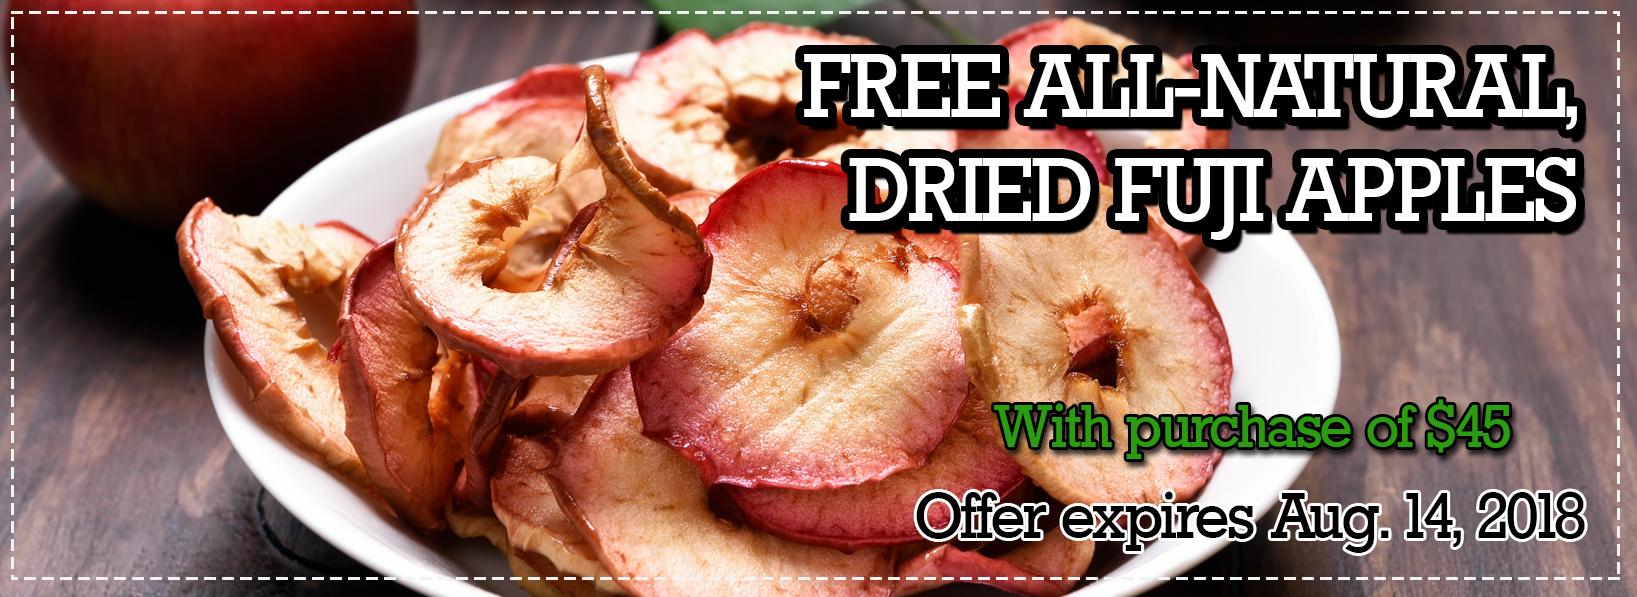 Free Fuji apples